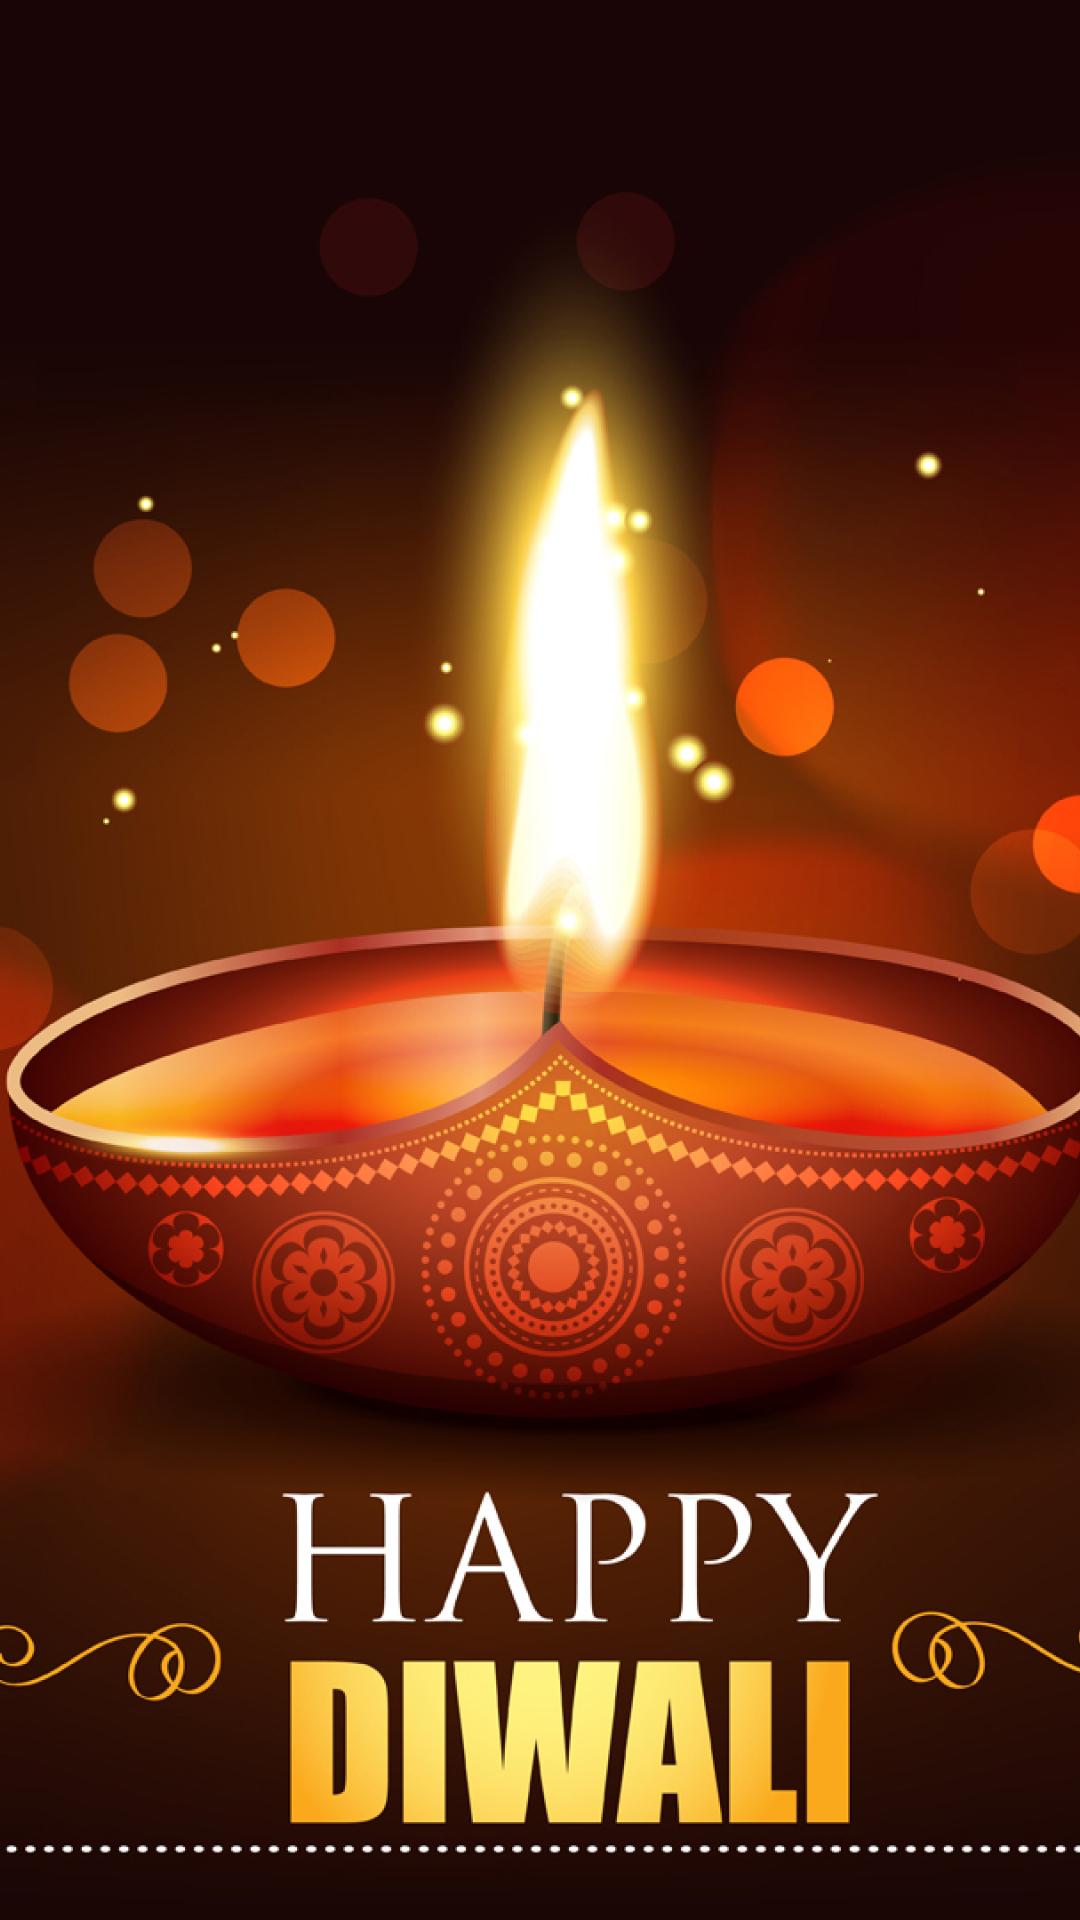 Happy Diwali 2020 Wallpaper in 1080x1920 Resolution